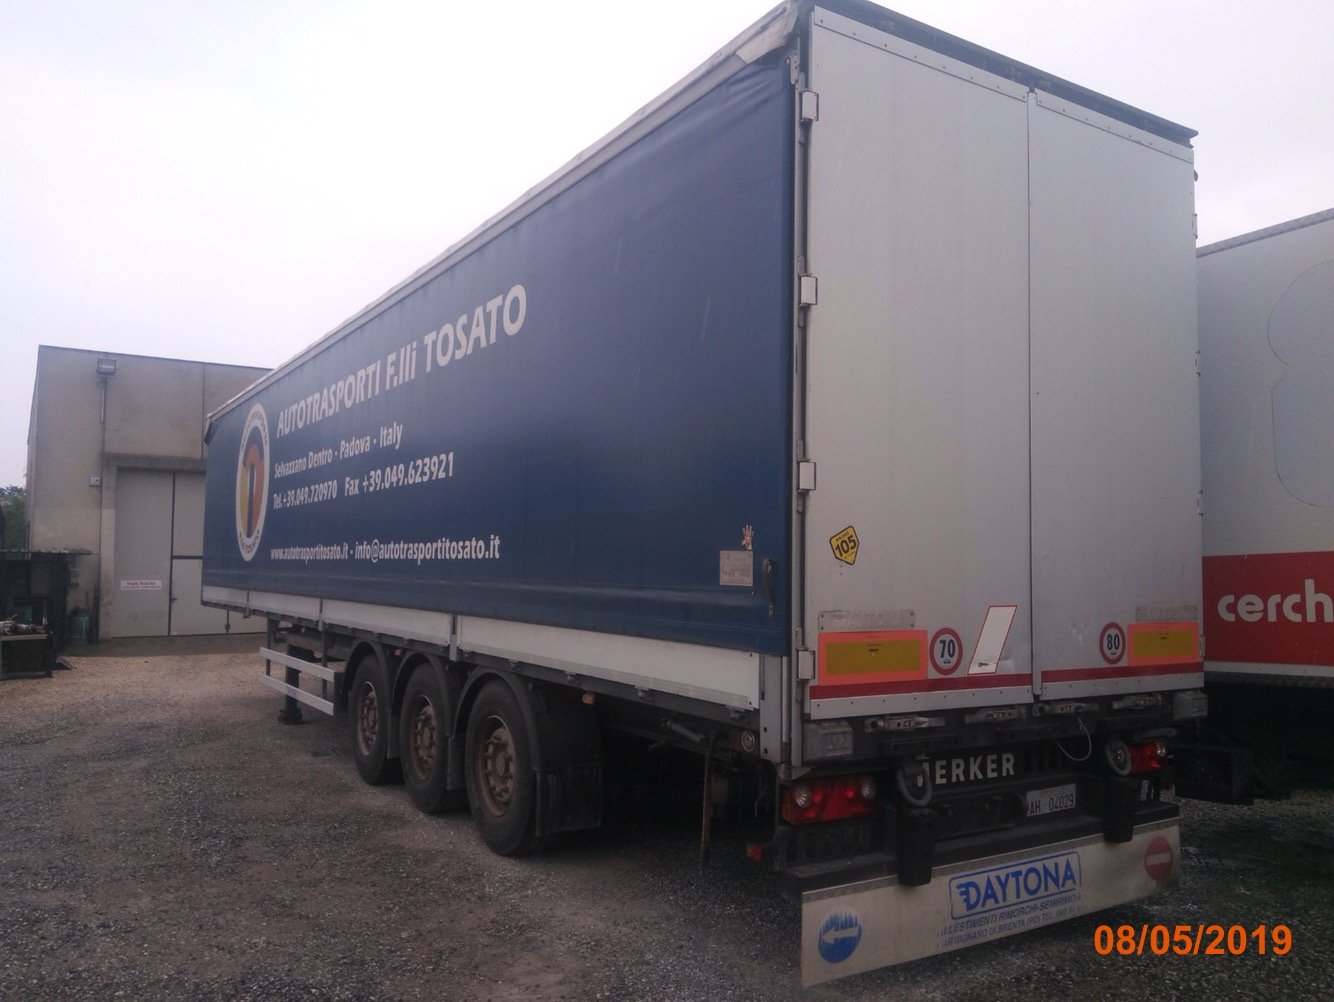 SEMIRIMORCHIO MERKER in vendita - foto 3